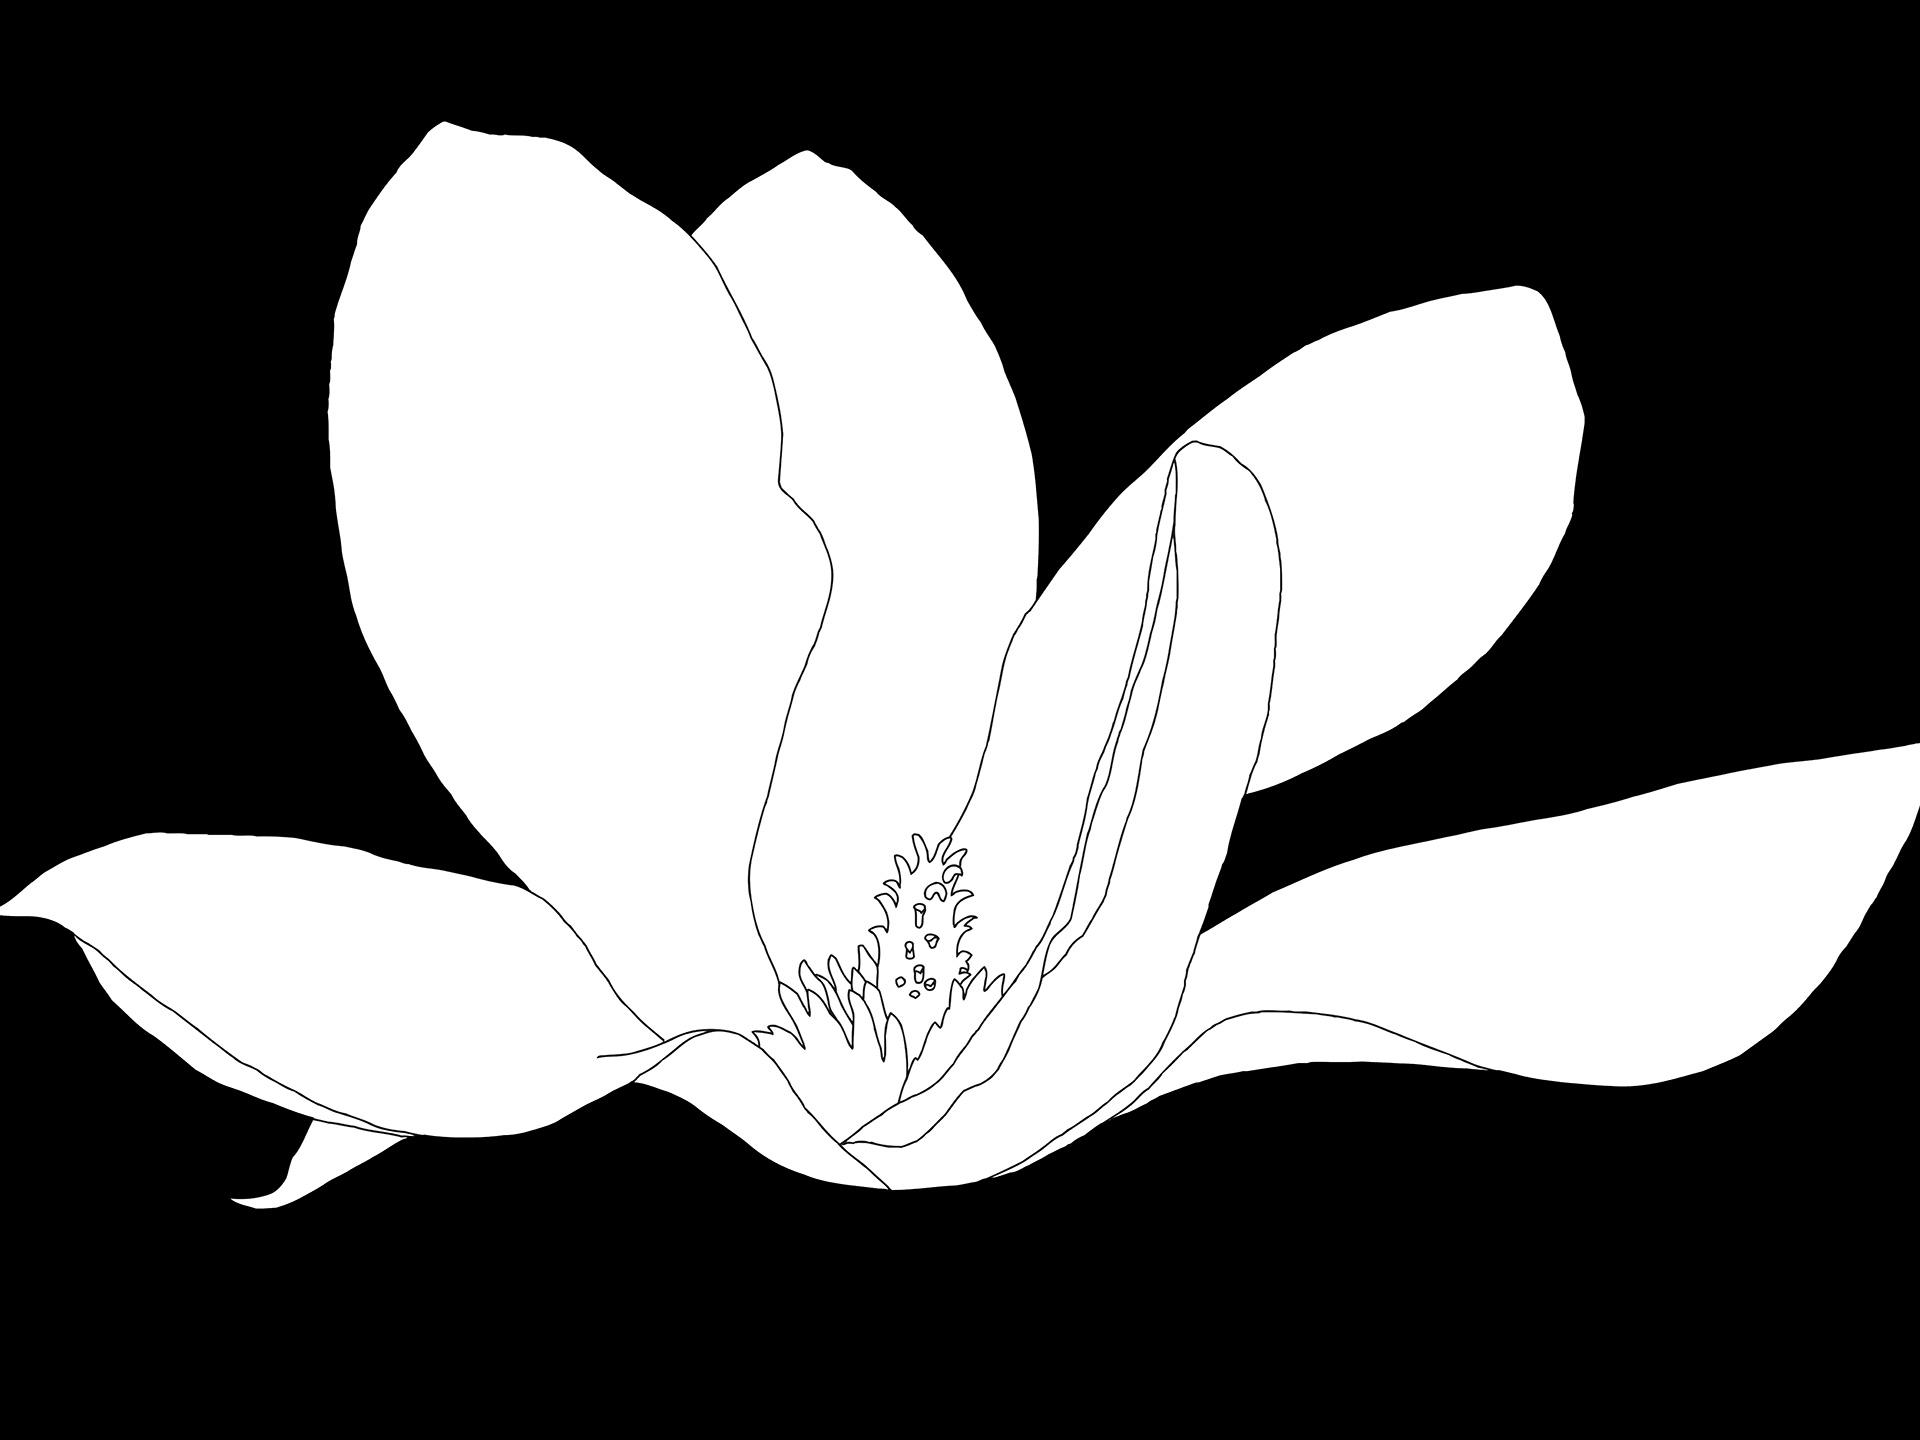 Magnolia-200-BW Drawing